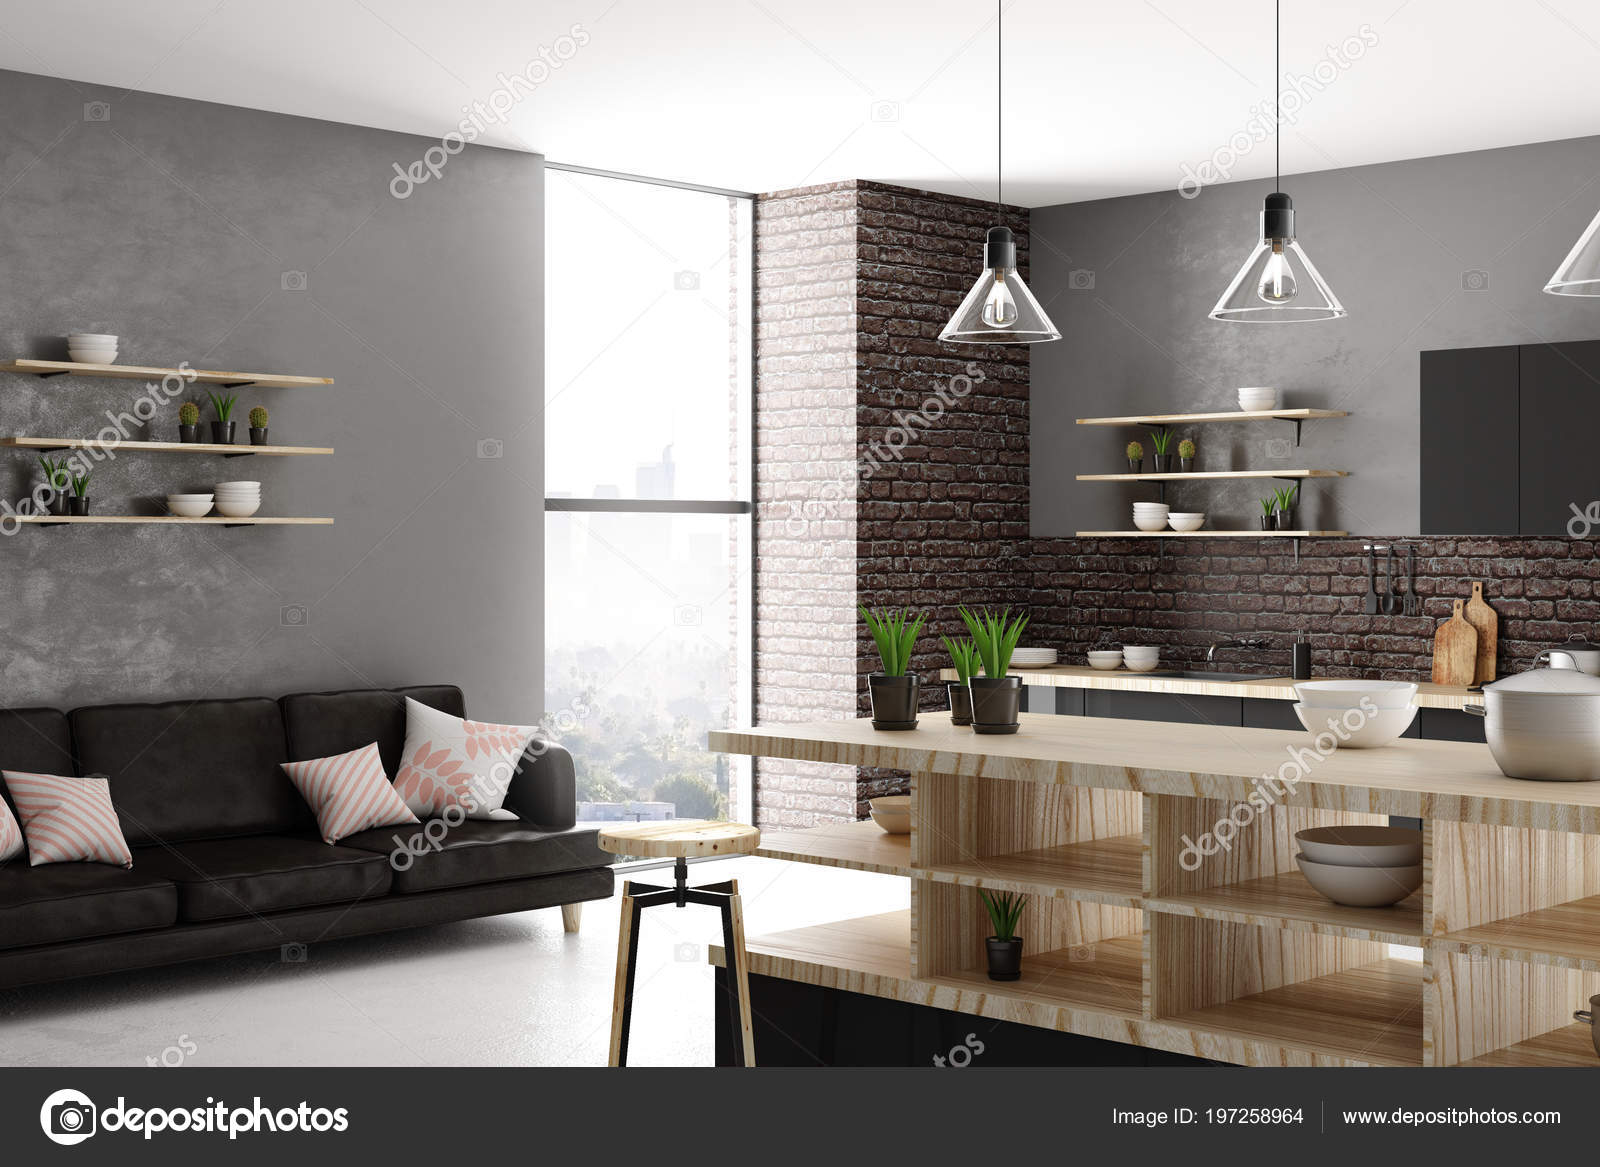 Daglicht Je Keuken : Stijlvolle lichte loft keuken interieur met meubels apparaten